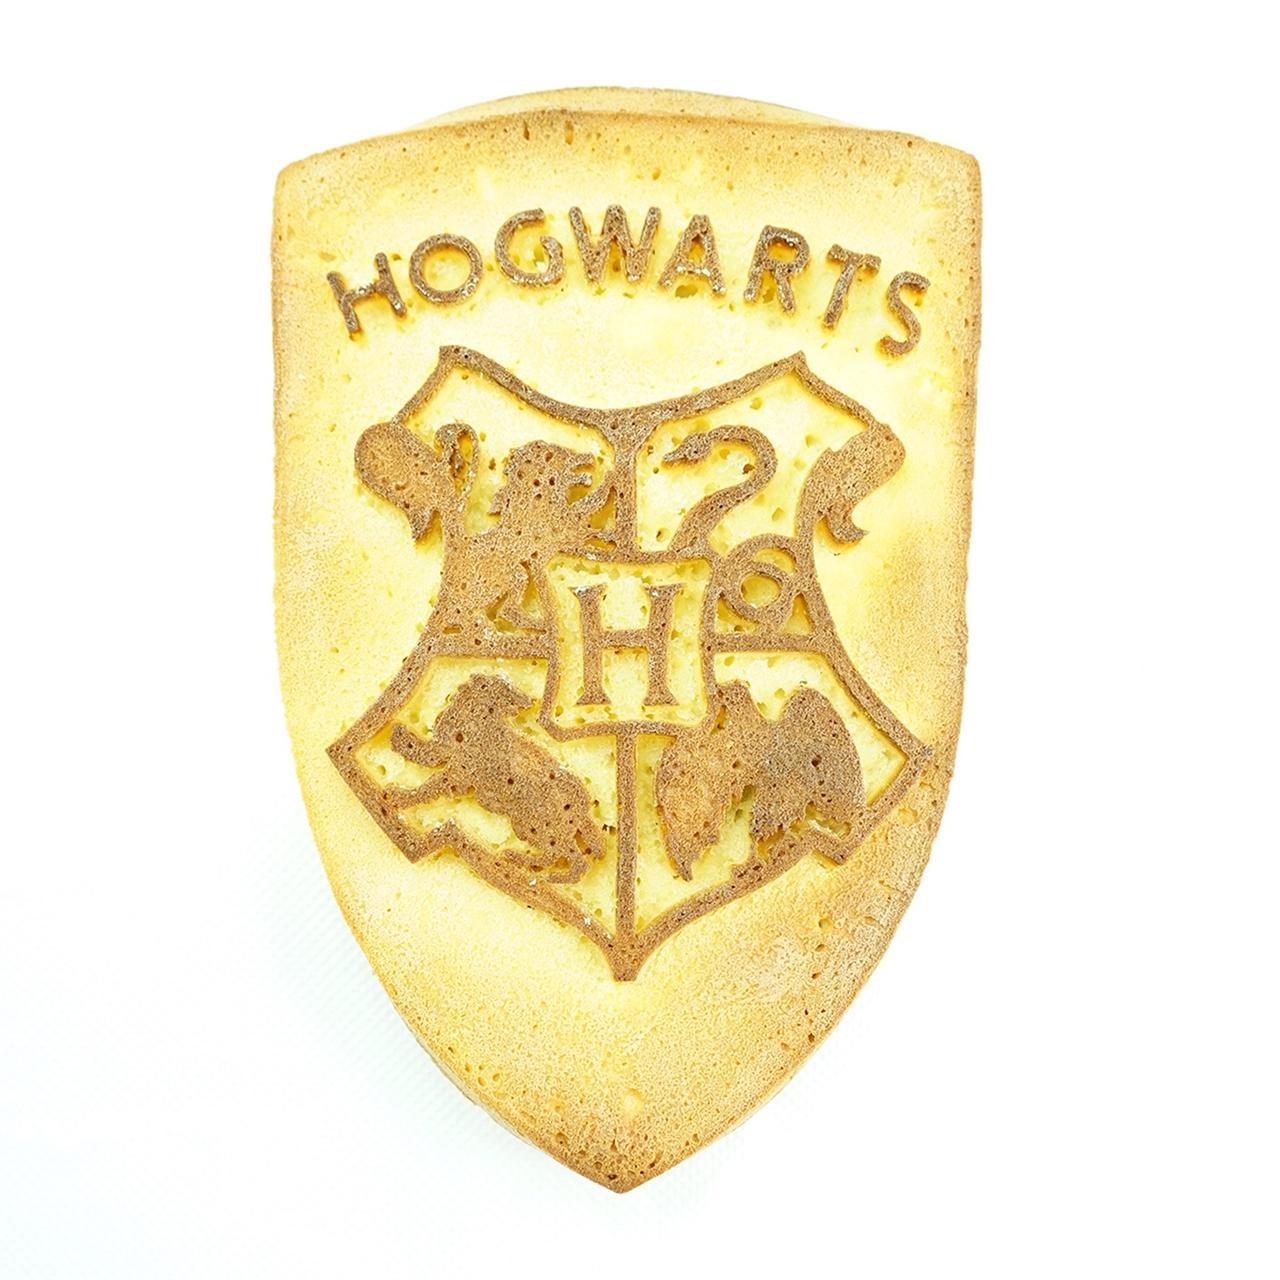 Imagen de Molde de Silicona, para Tartas, Hogwarts Crest